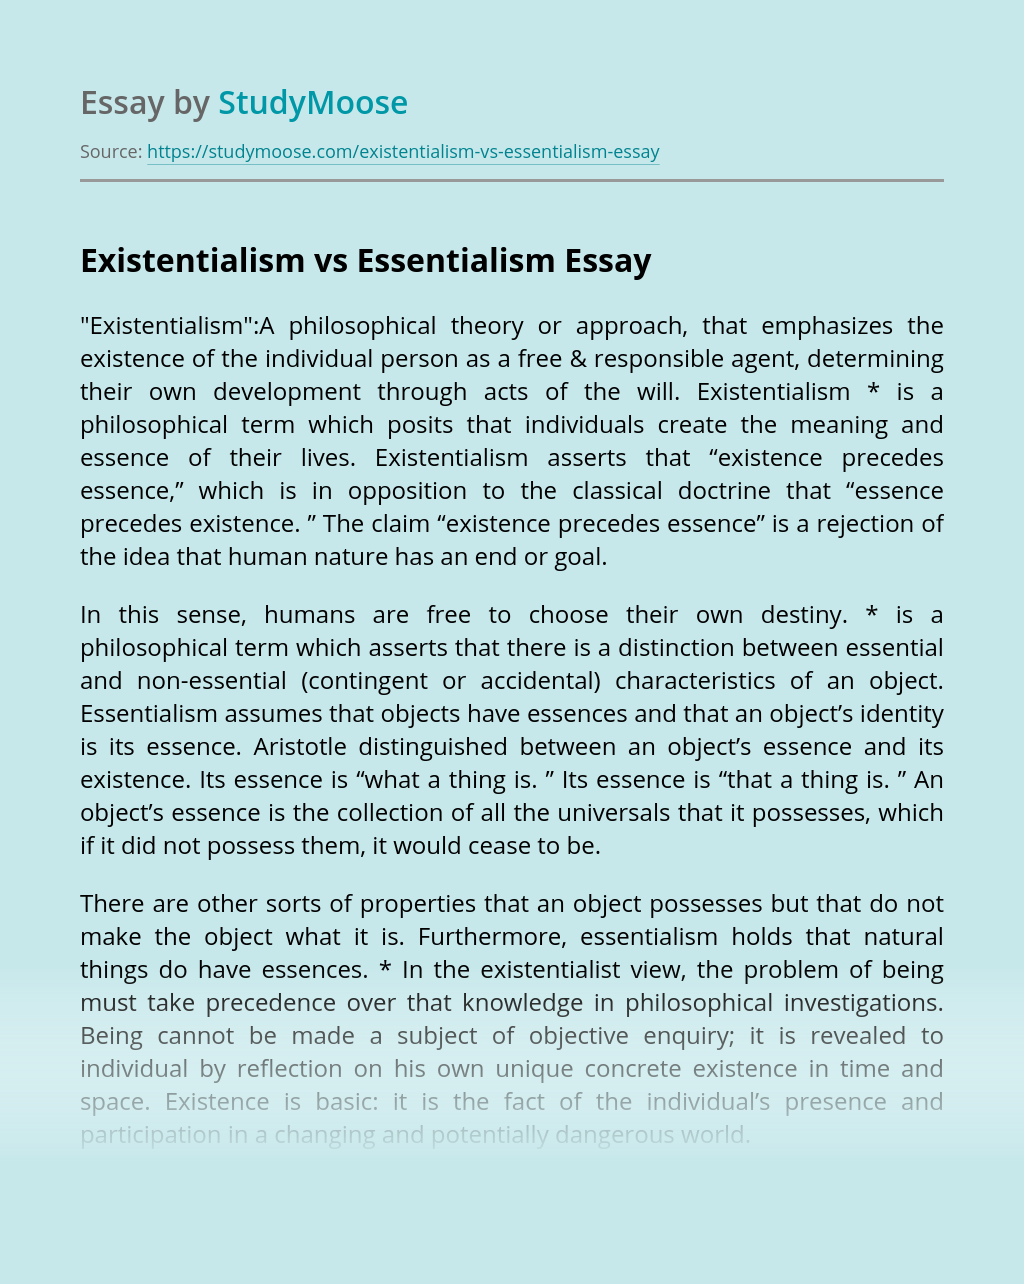 Existentialism vs Essentialism